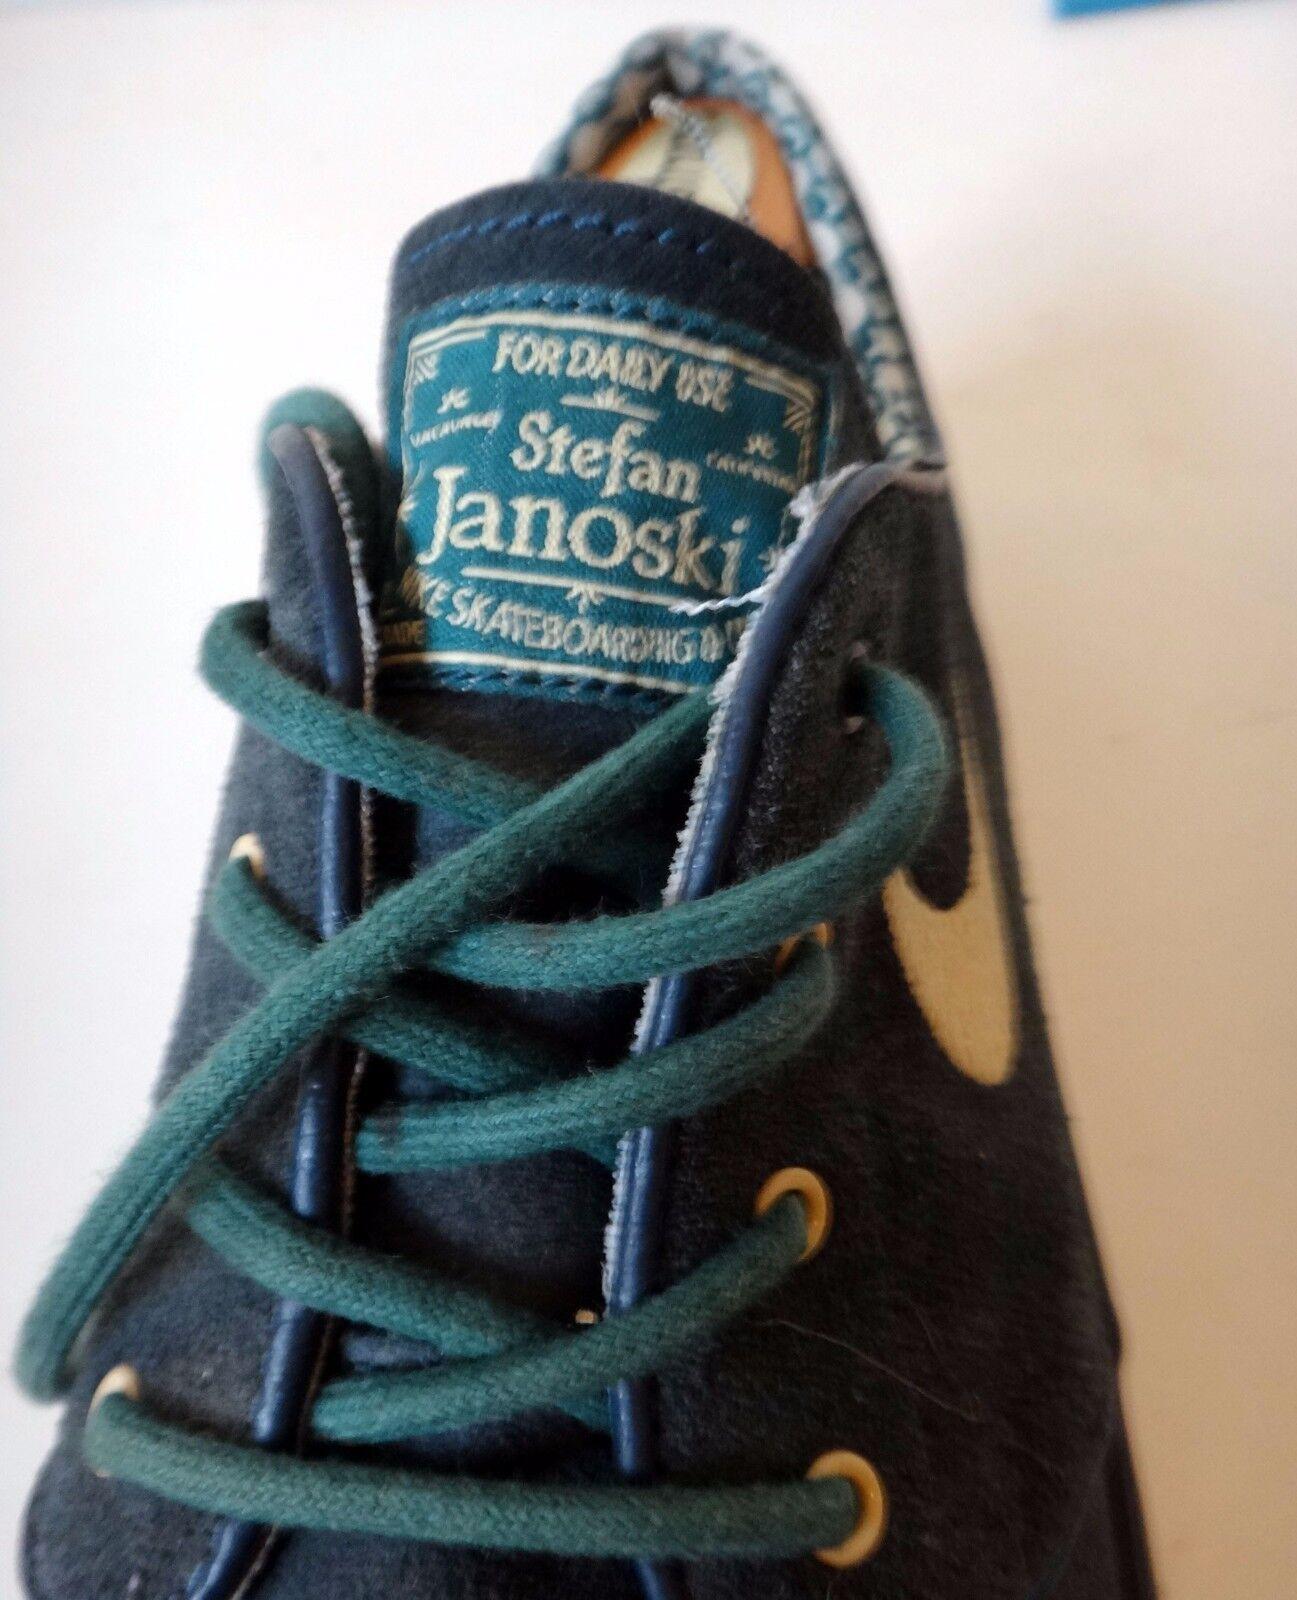 Stefan janoski nike sb - blau luft 11.5us 45.5eu blau - bestickt skateboard. 4c7ef1